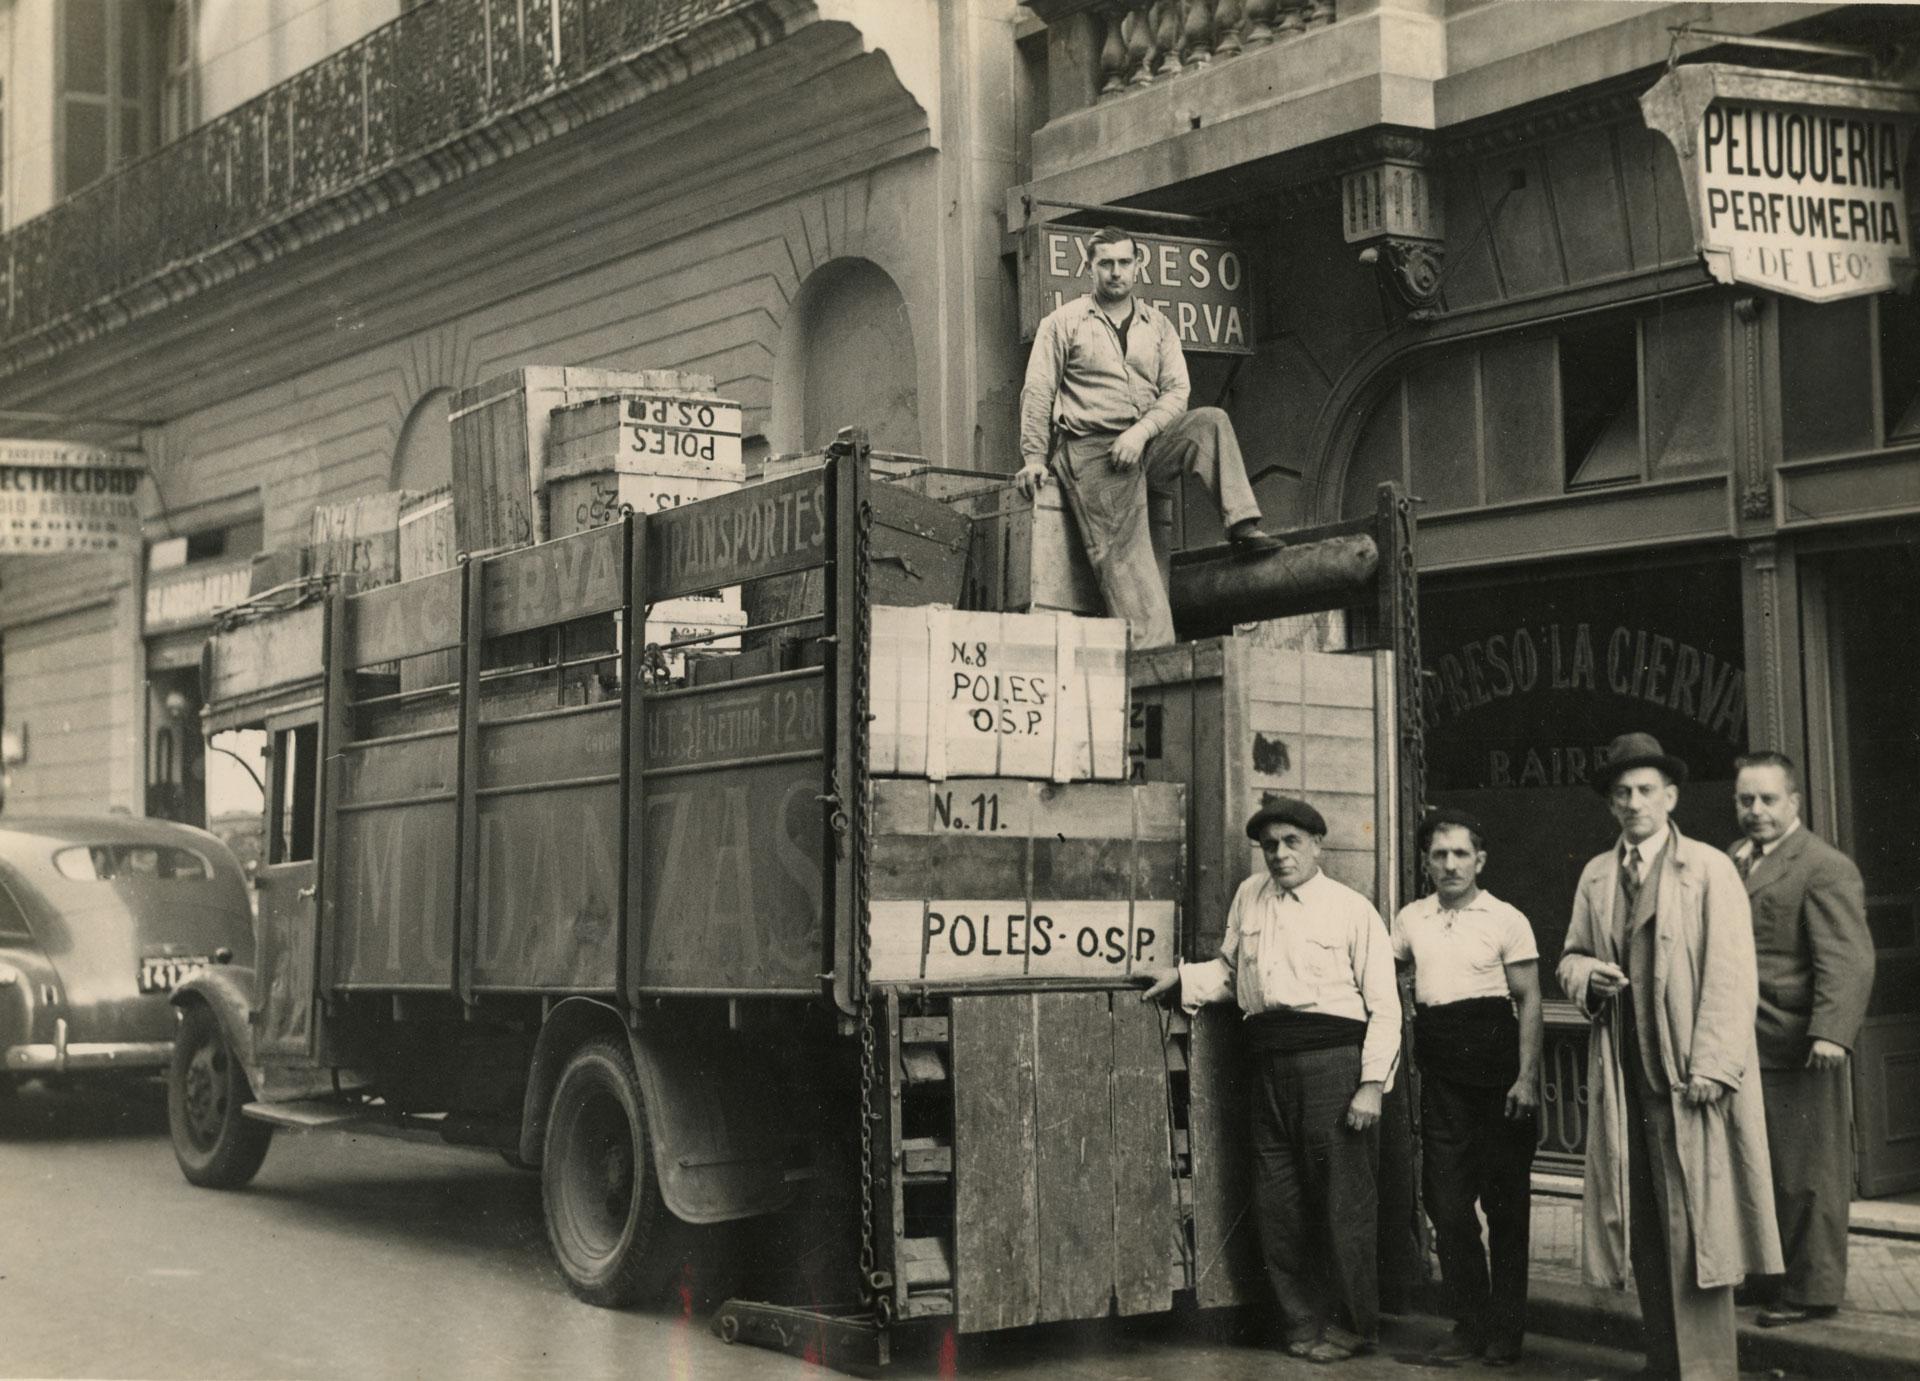 Ciężarówka w Buenos Aires